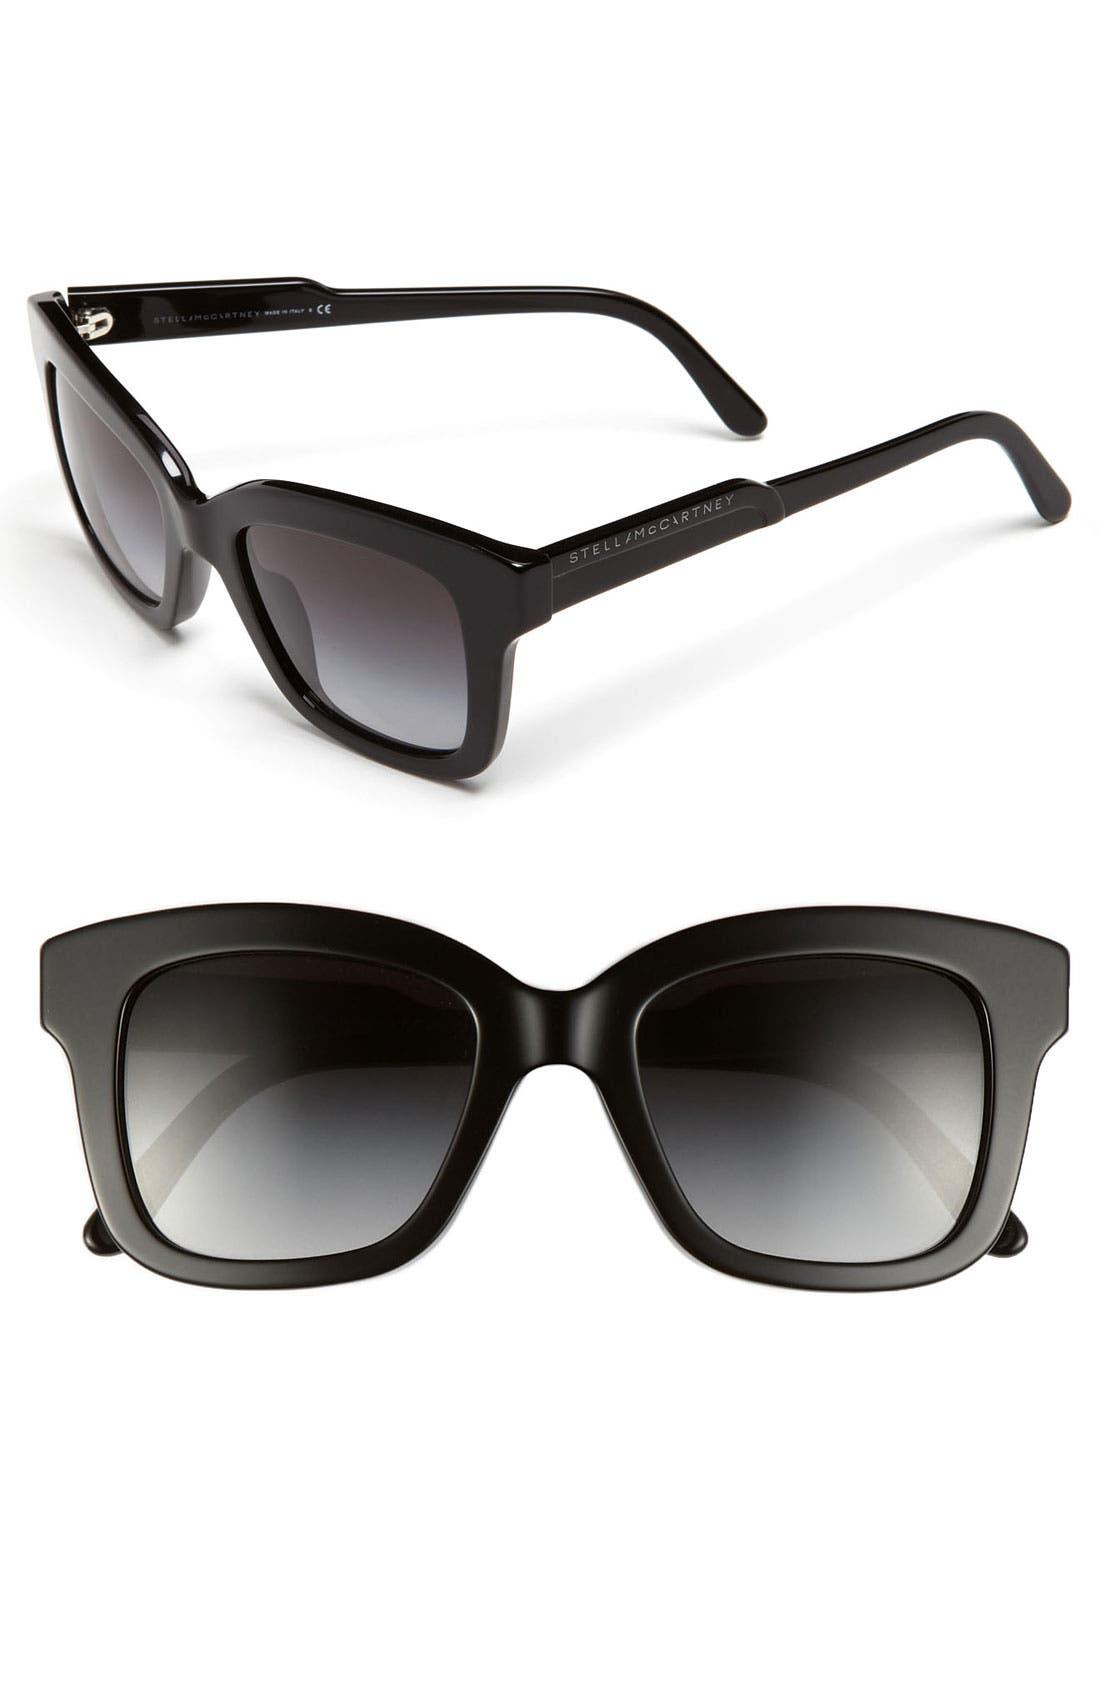 42mm Retro Sunglasses,                             Main thumbnail 1, color,                             001